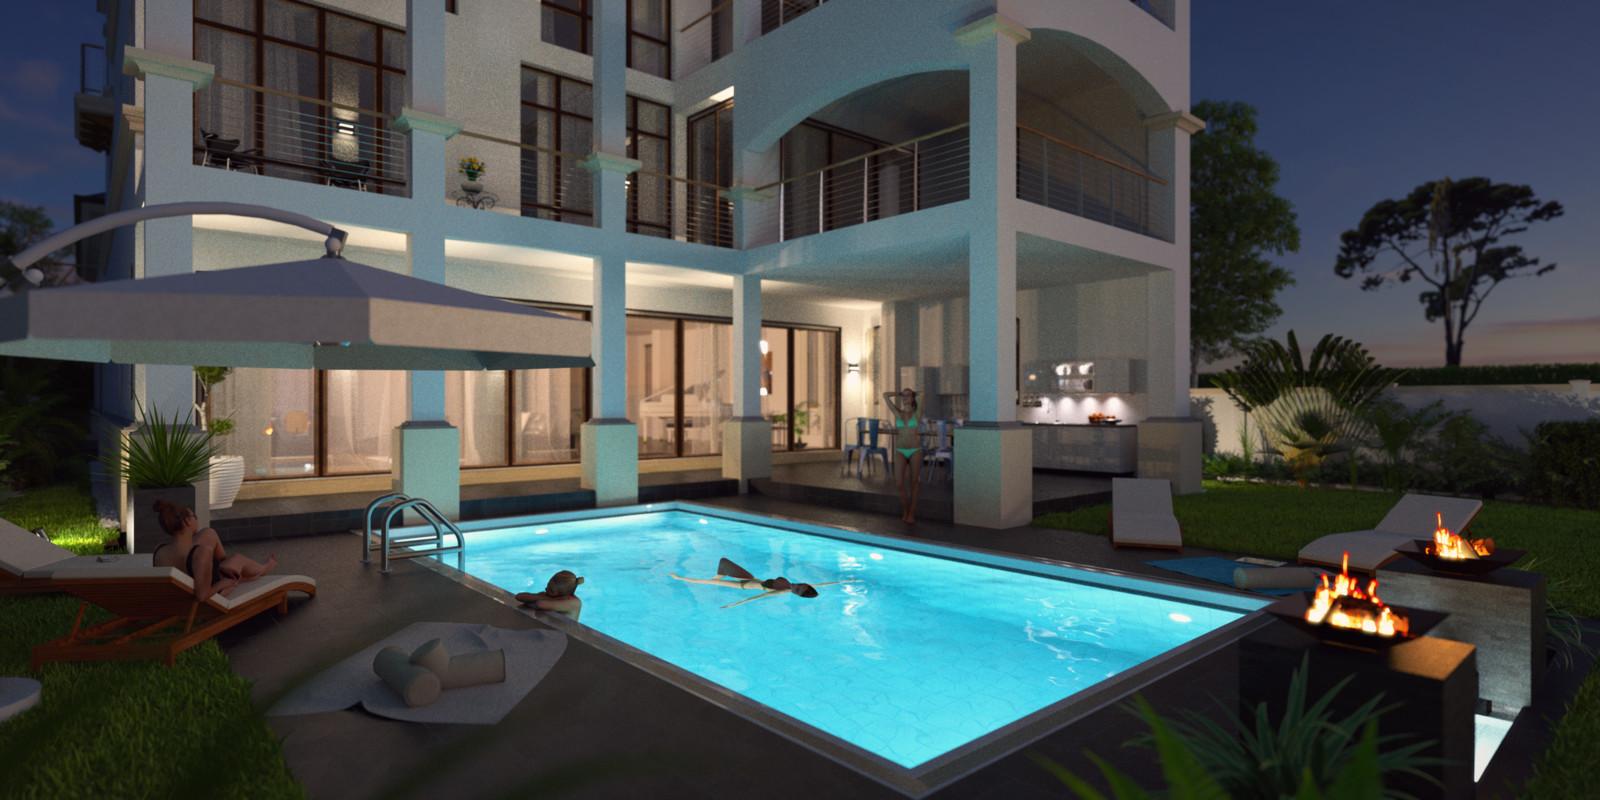 SketchUp + Thea Render  Seagrove Beach House: Poolside 03 2pt Night C Glare 02 Karl 2160 × 1080 Presto MC Bucket